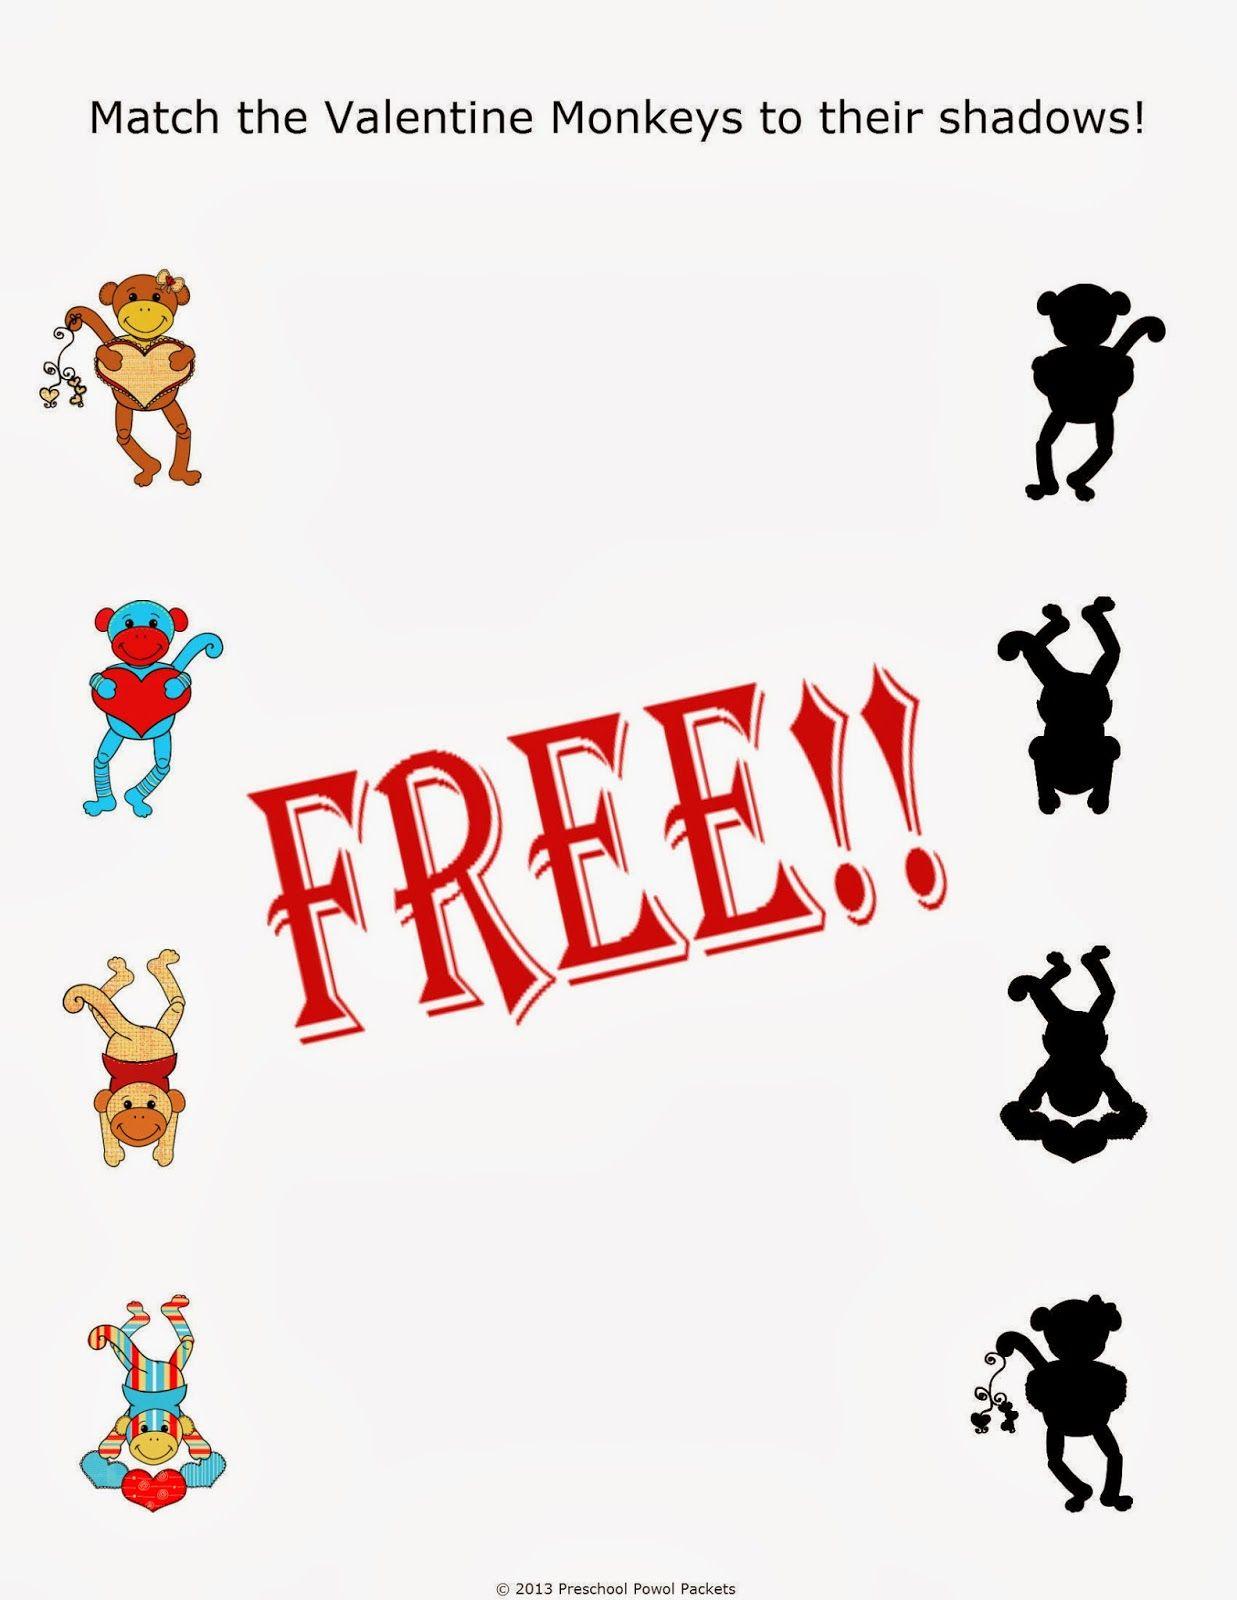 Preschool Powol Packets Free Preschool Valentine Shadow